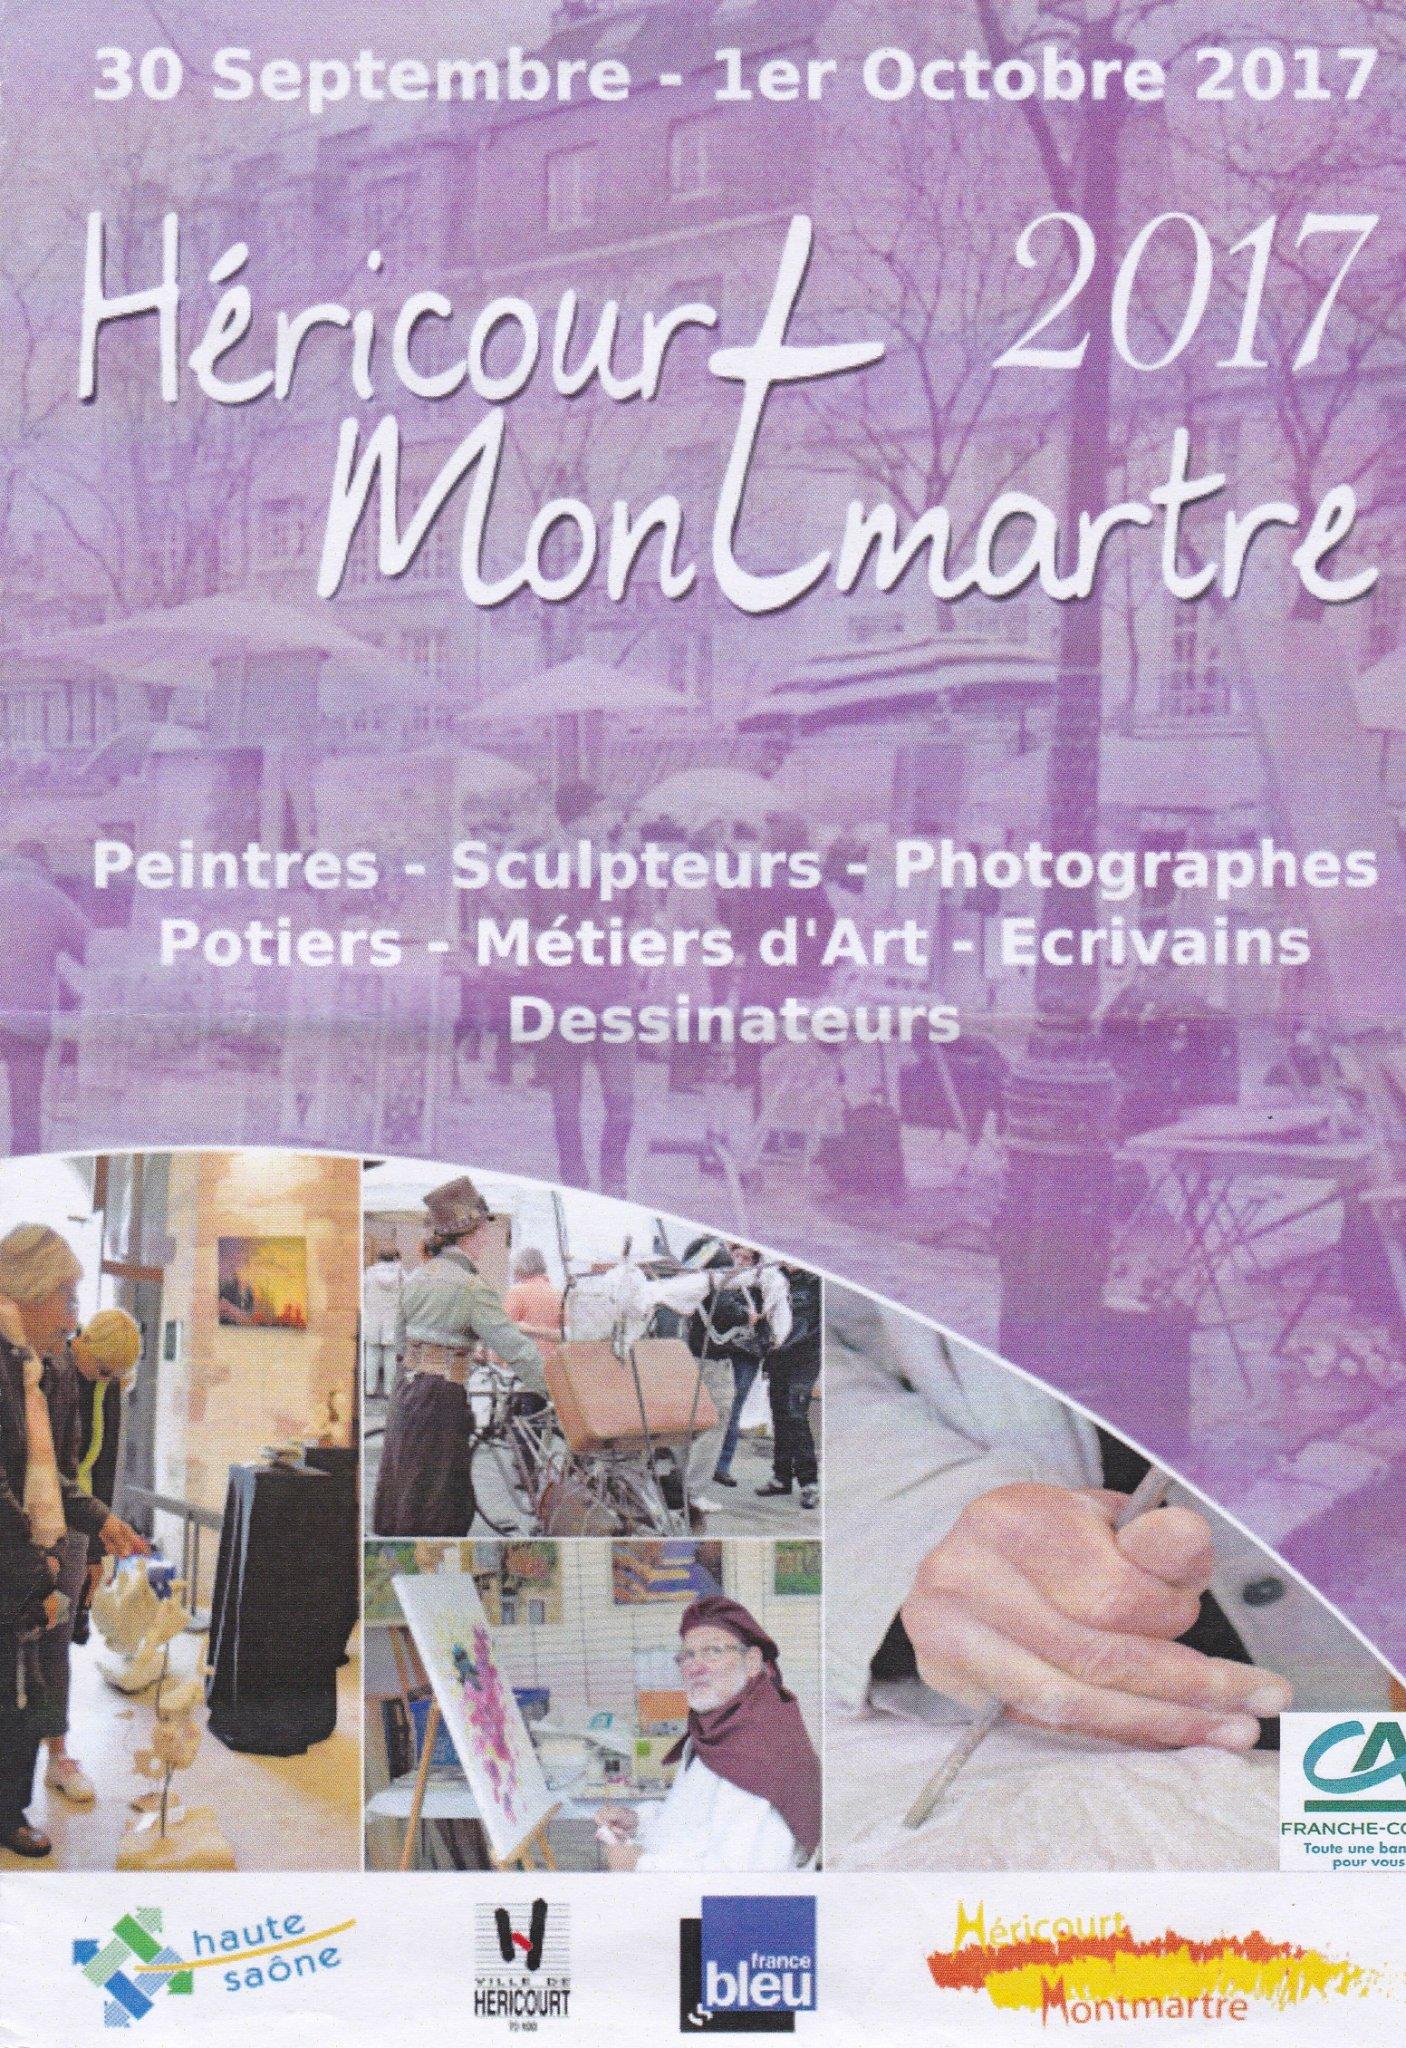 Exposition hericourt montmartre